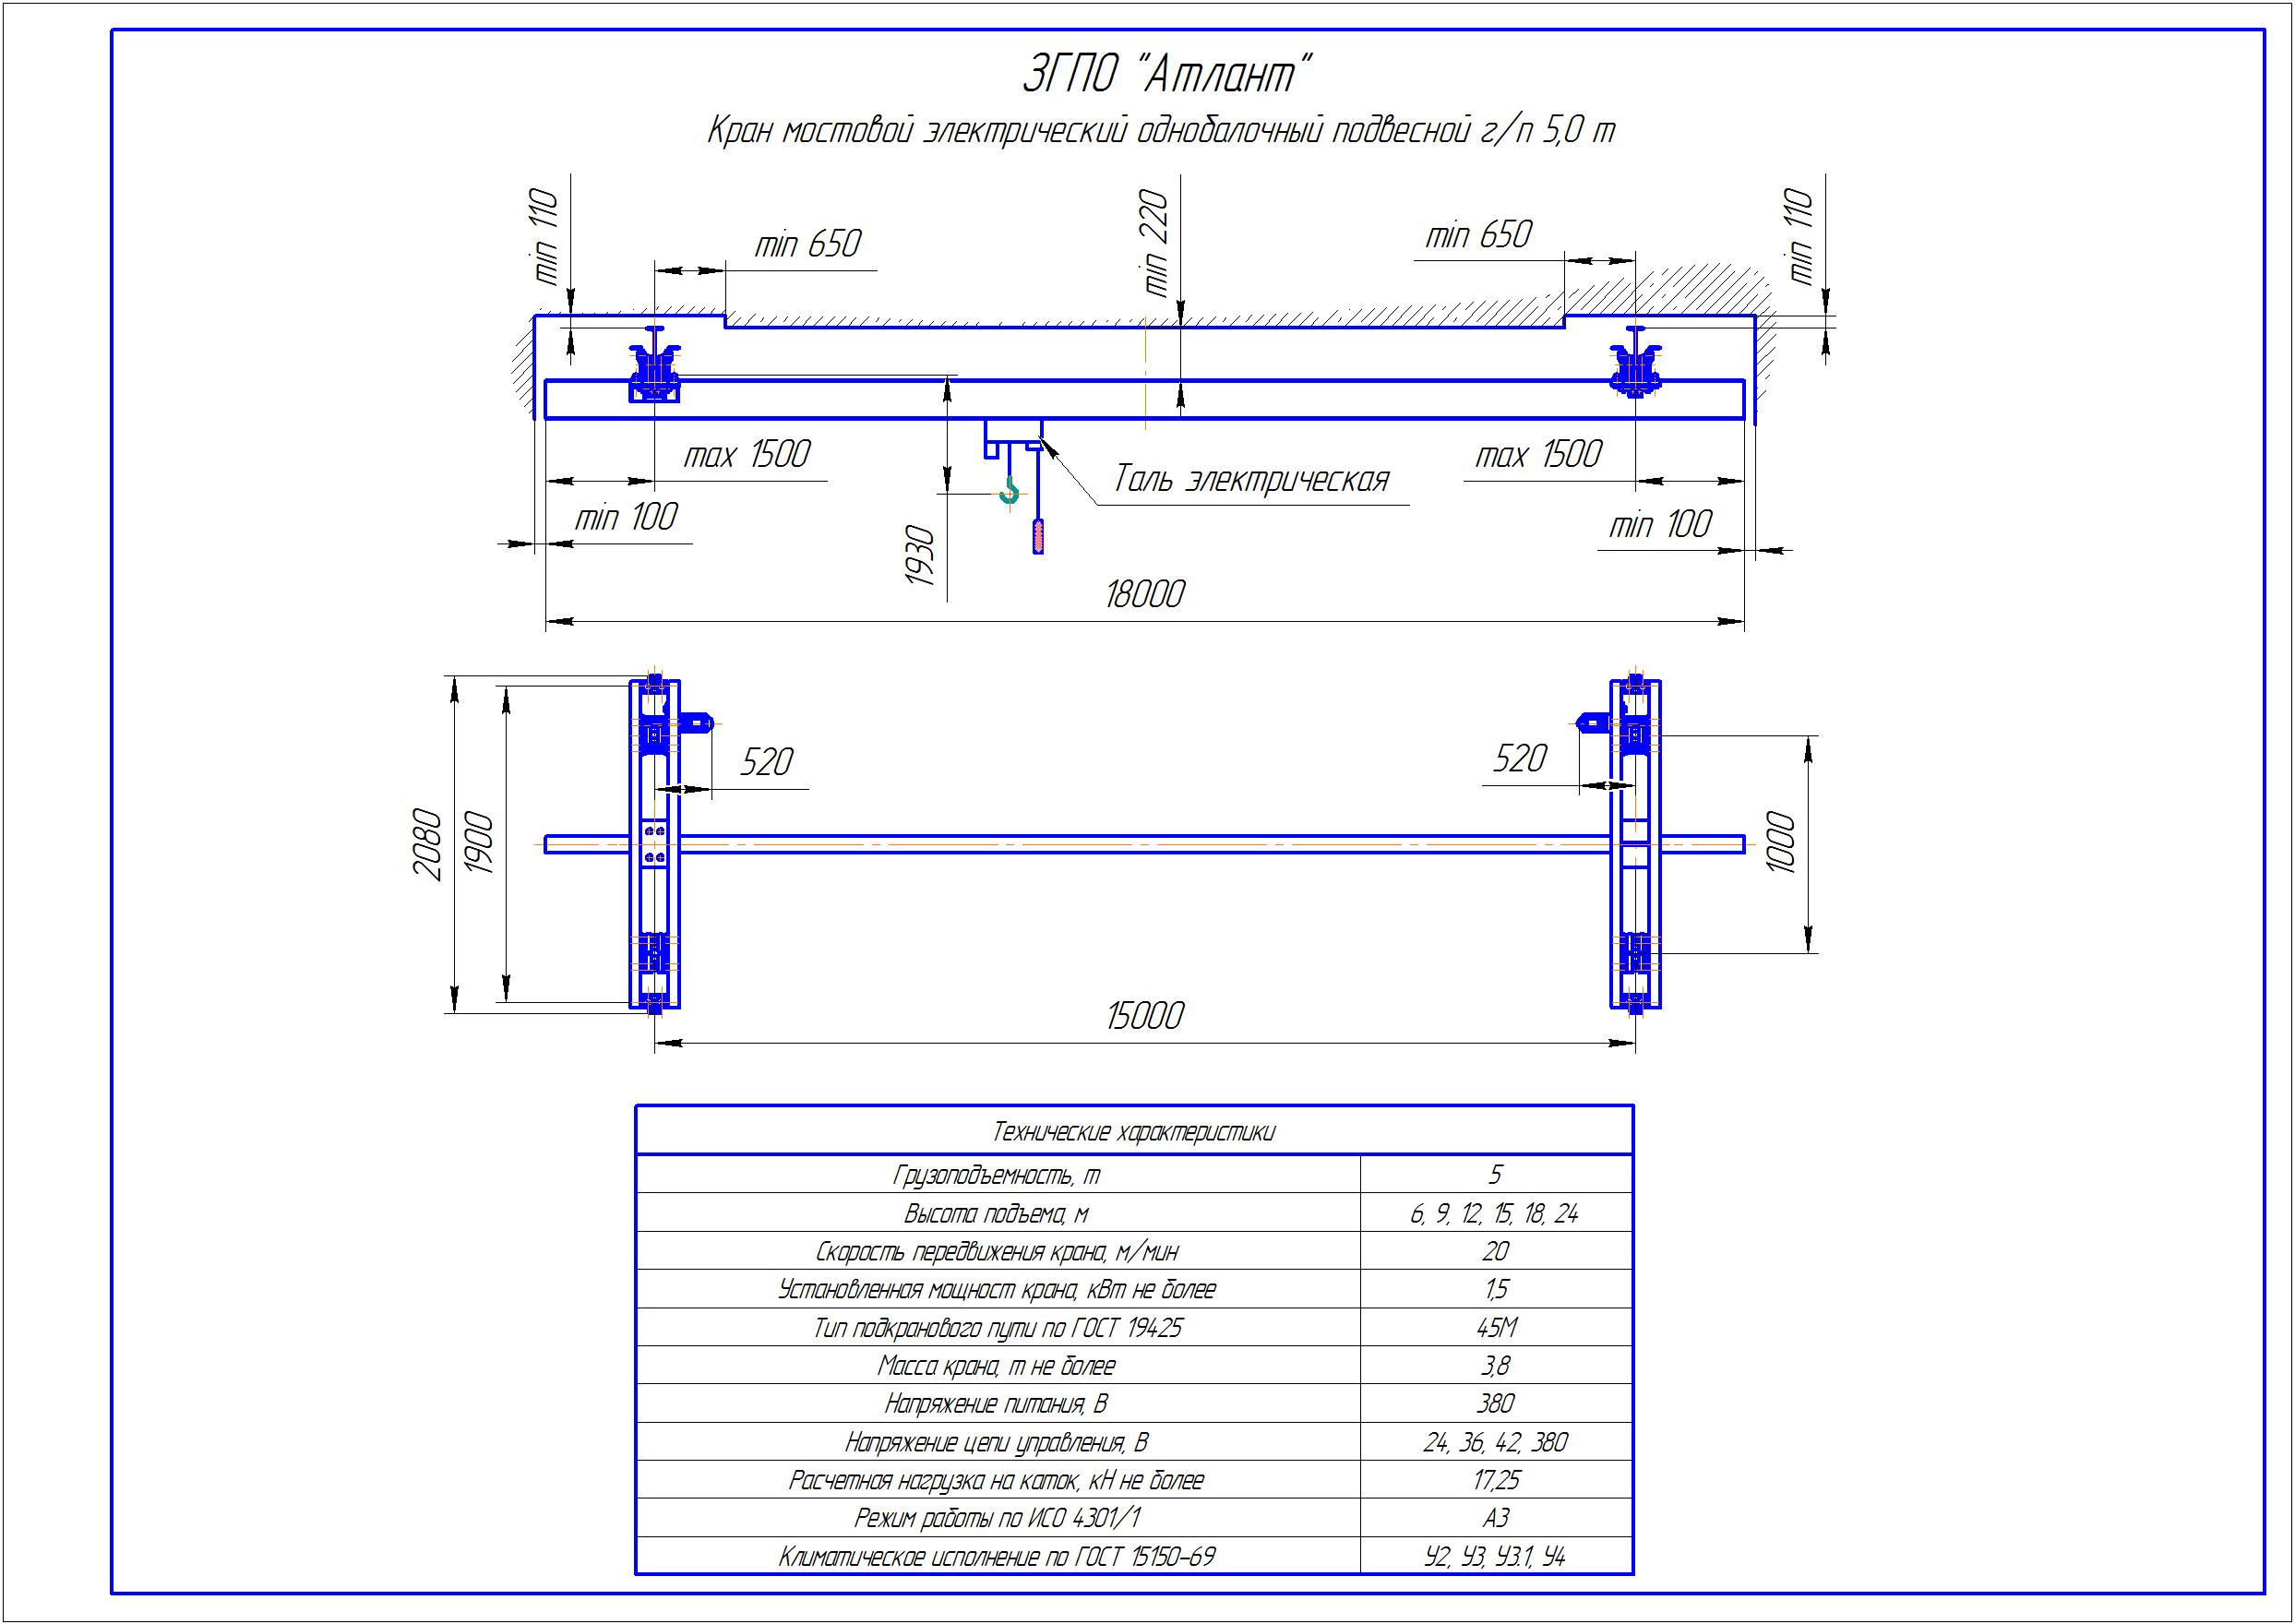 KBP 4 5 - Подвесная кран балка